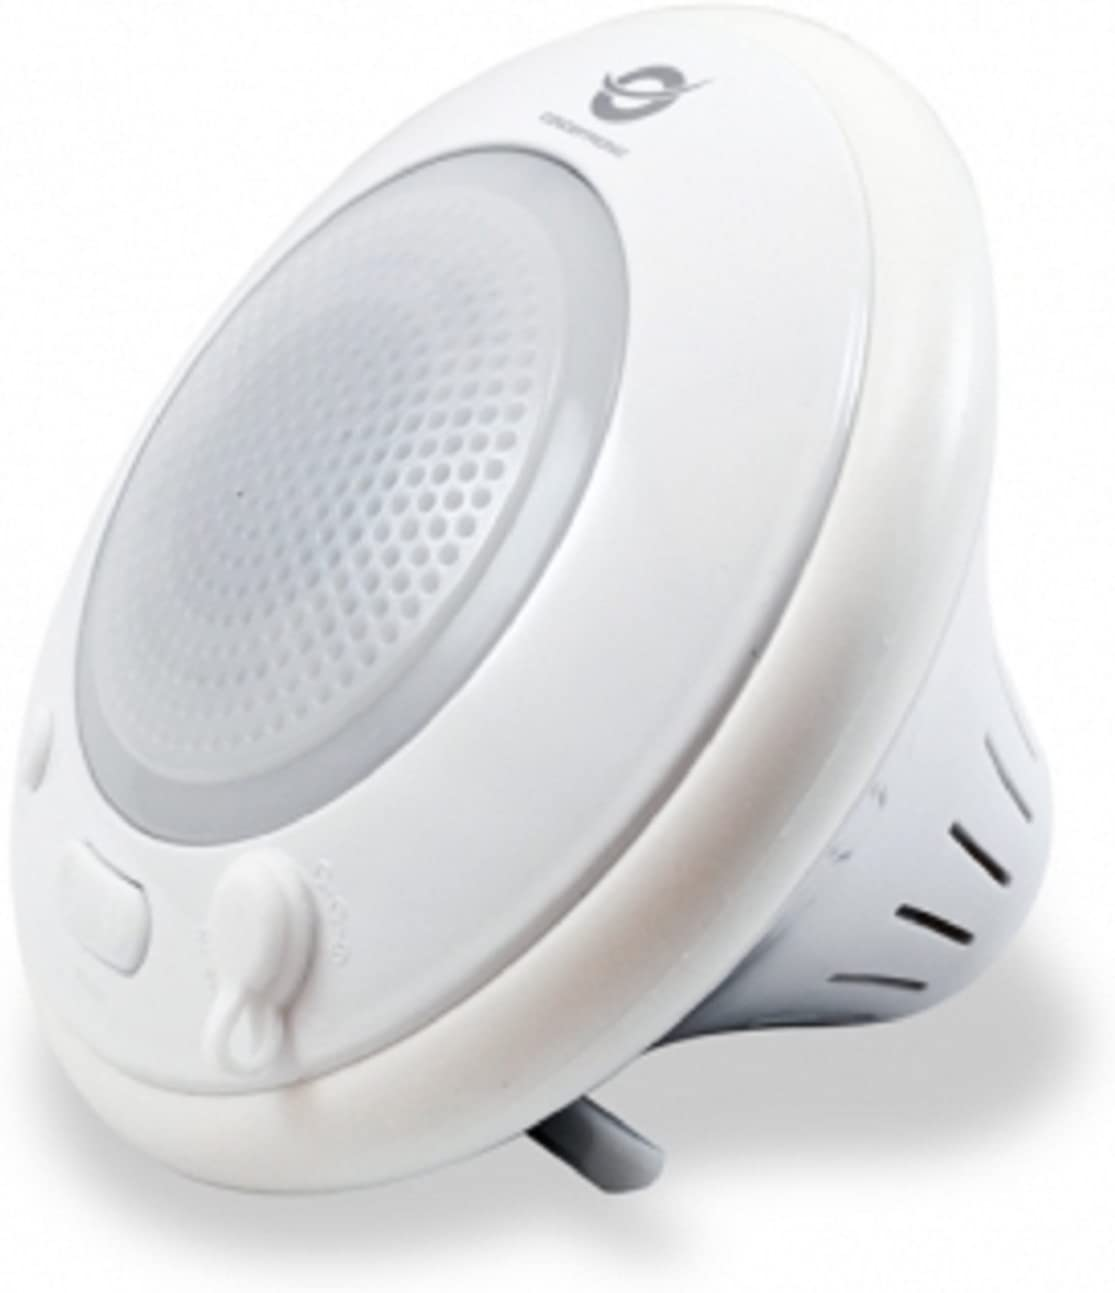 Conceptronic Altavoz Flotante impermeable inalámbrico - Altavoces portátiles (Inalámbrico, Batería, USB, 100-18000 Hz, Bluetooth, Universal, Otro)